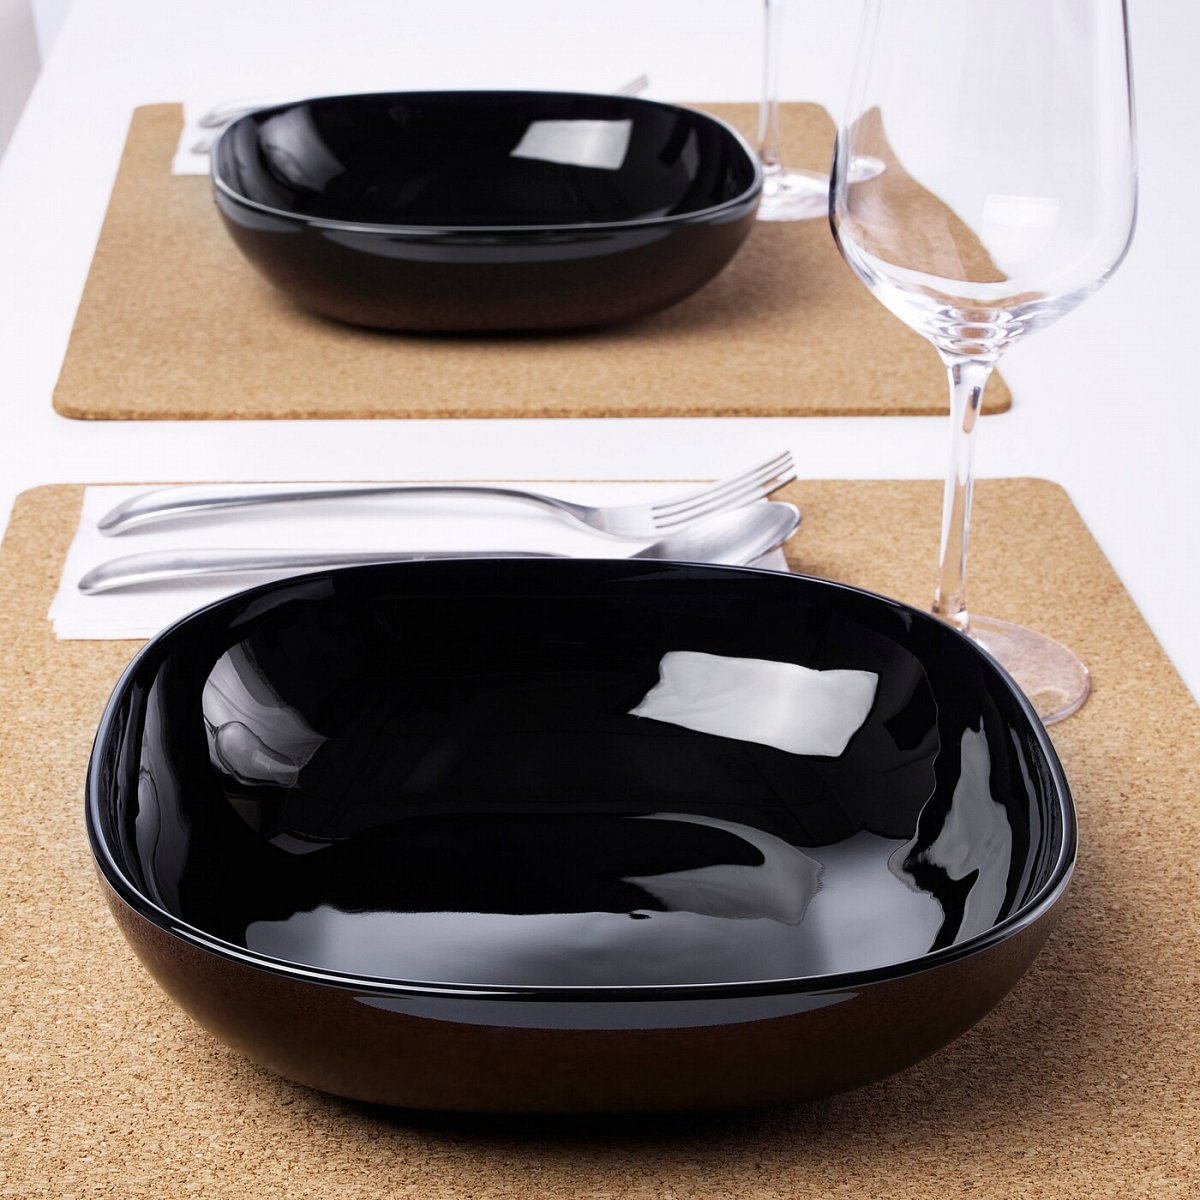 БАККИГ, Тарелка глубокая, черный, 20x20 см - фото 1